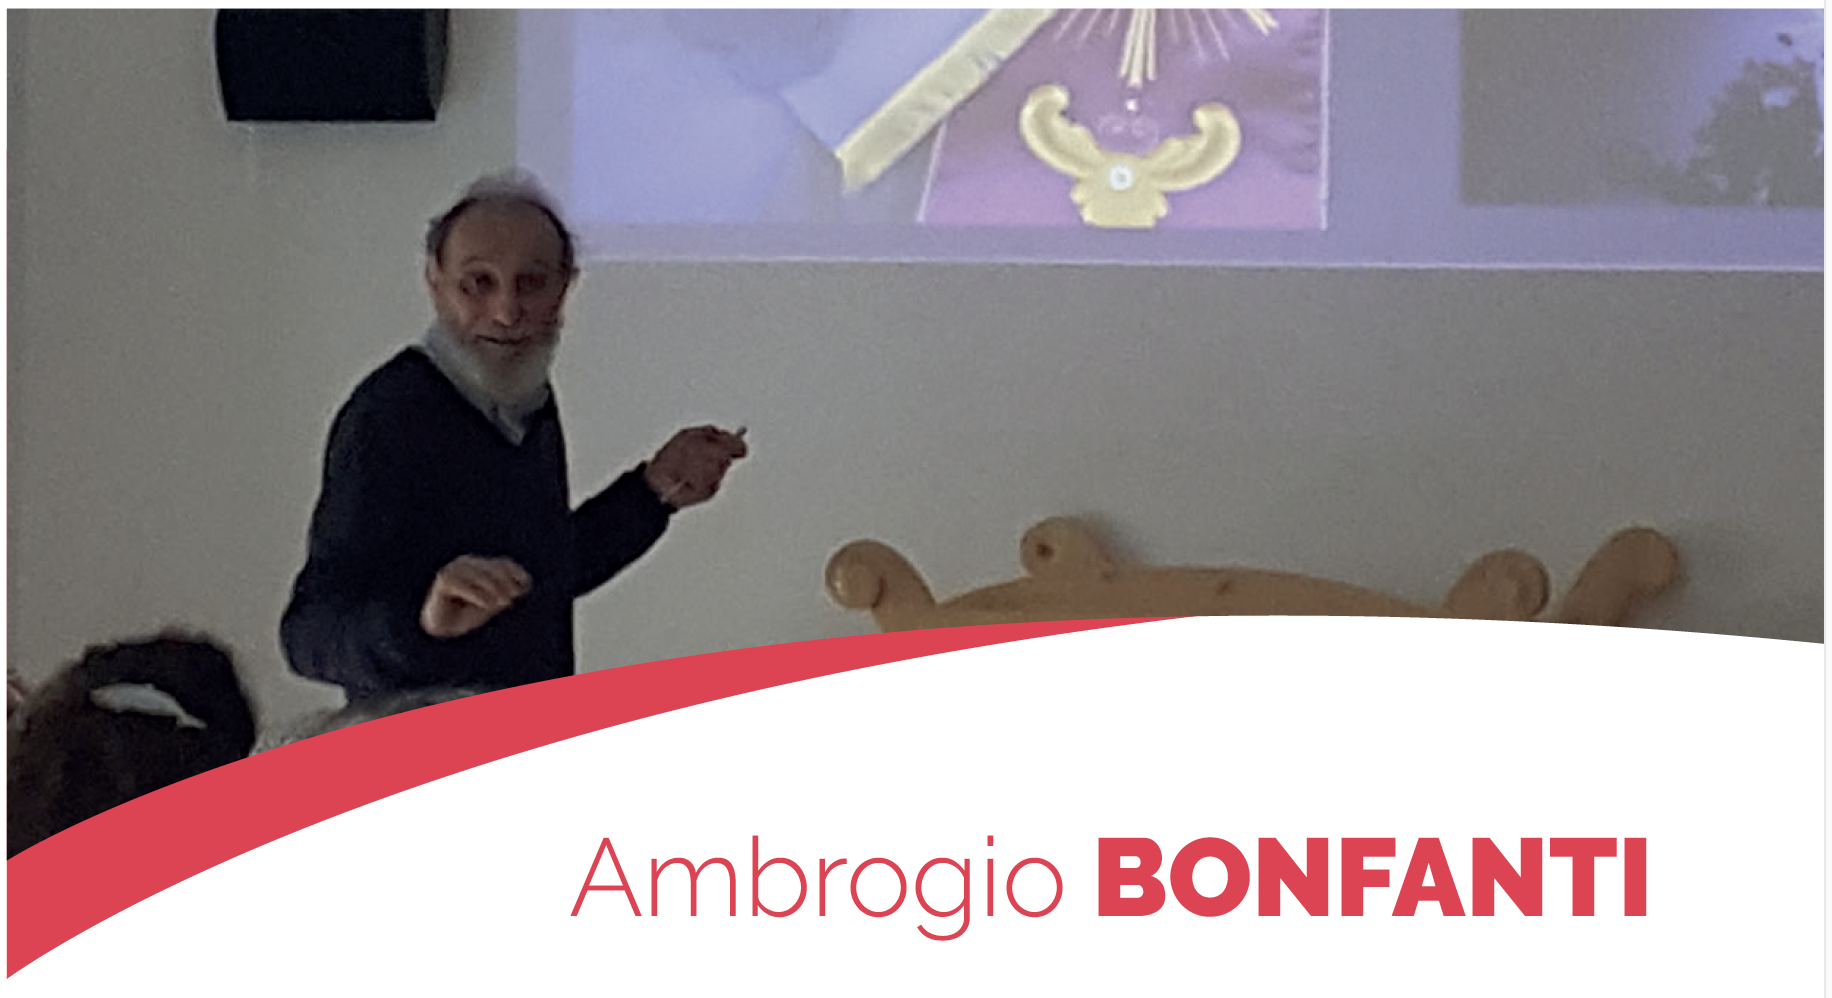 Ambrogio Bonfanti